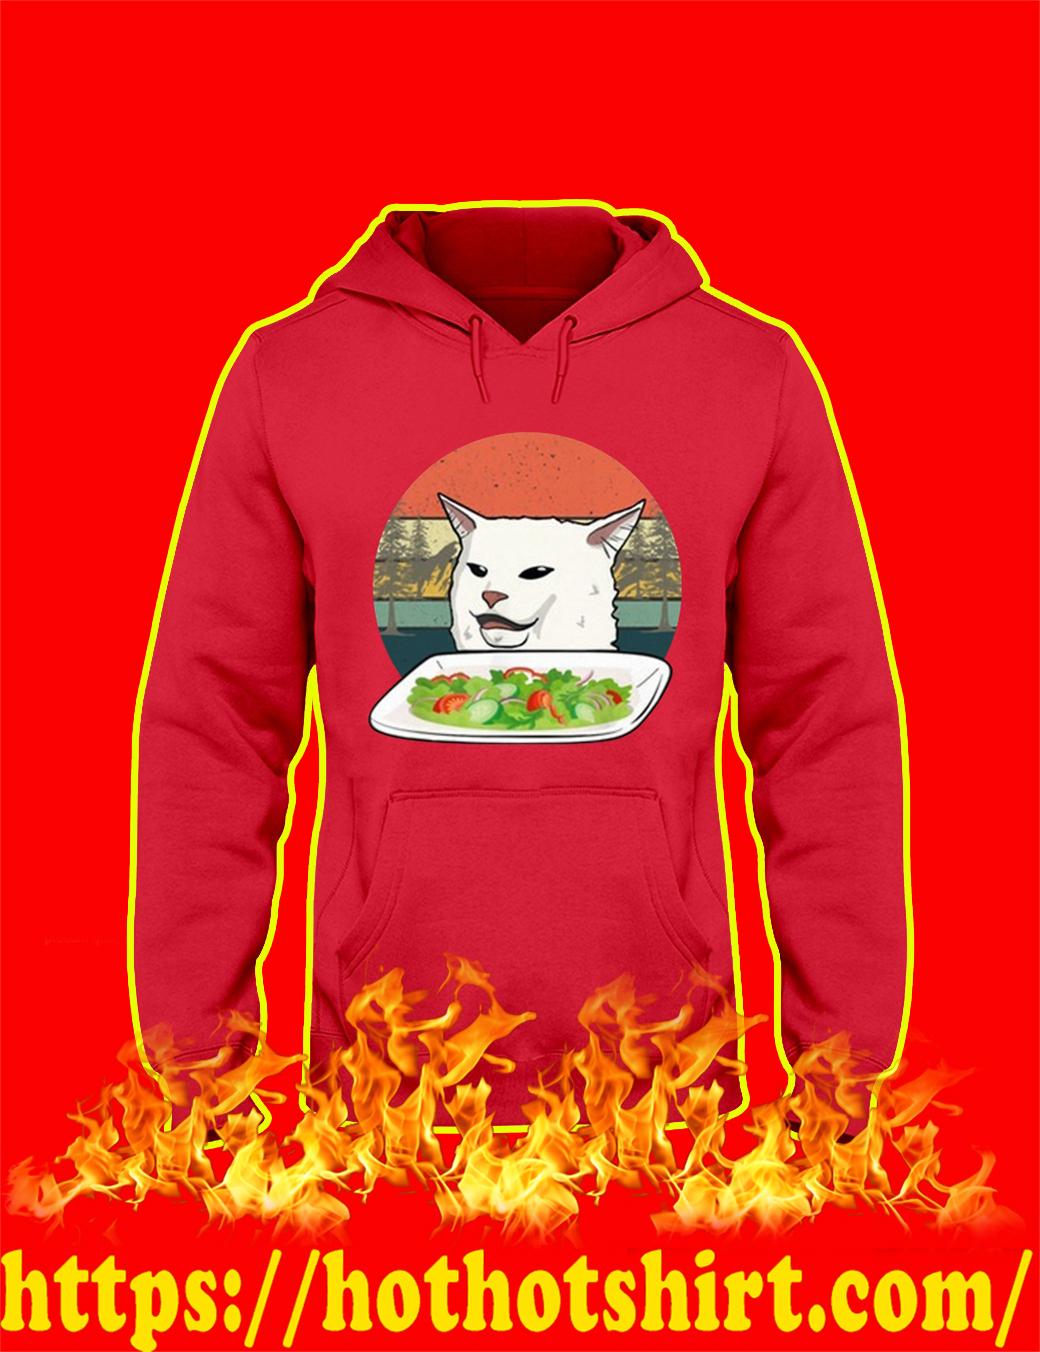 Smudge the Cat Meme hoodie